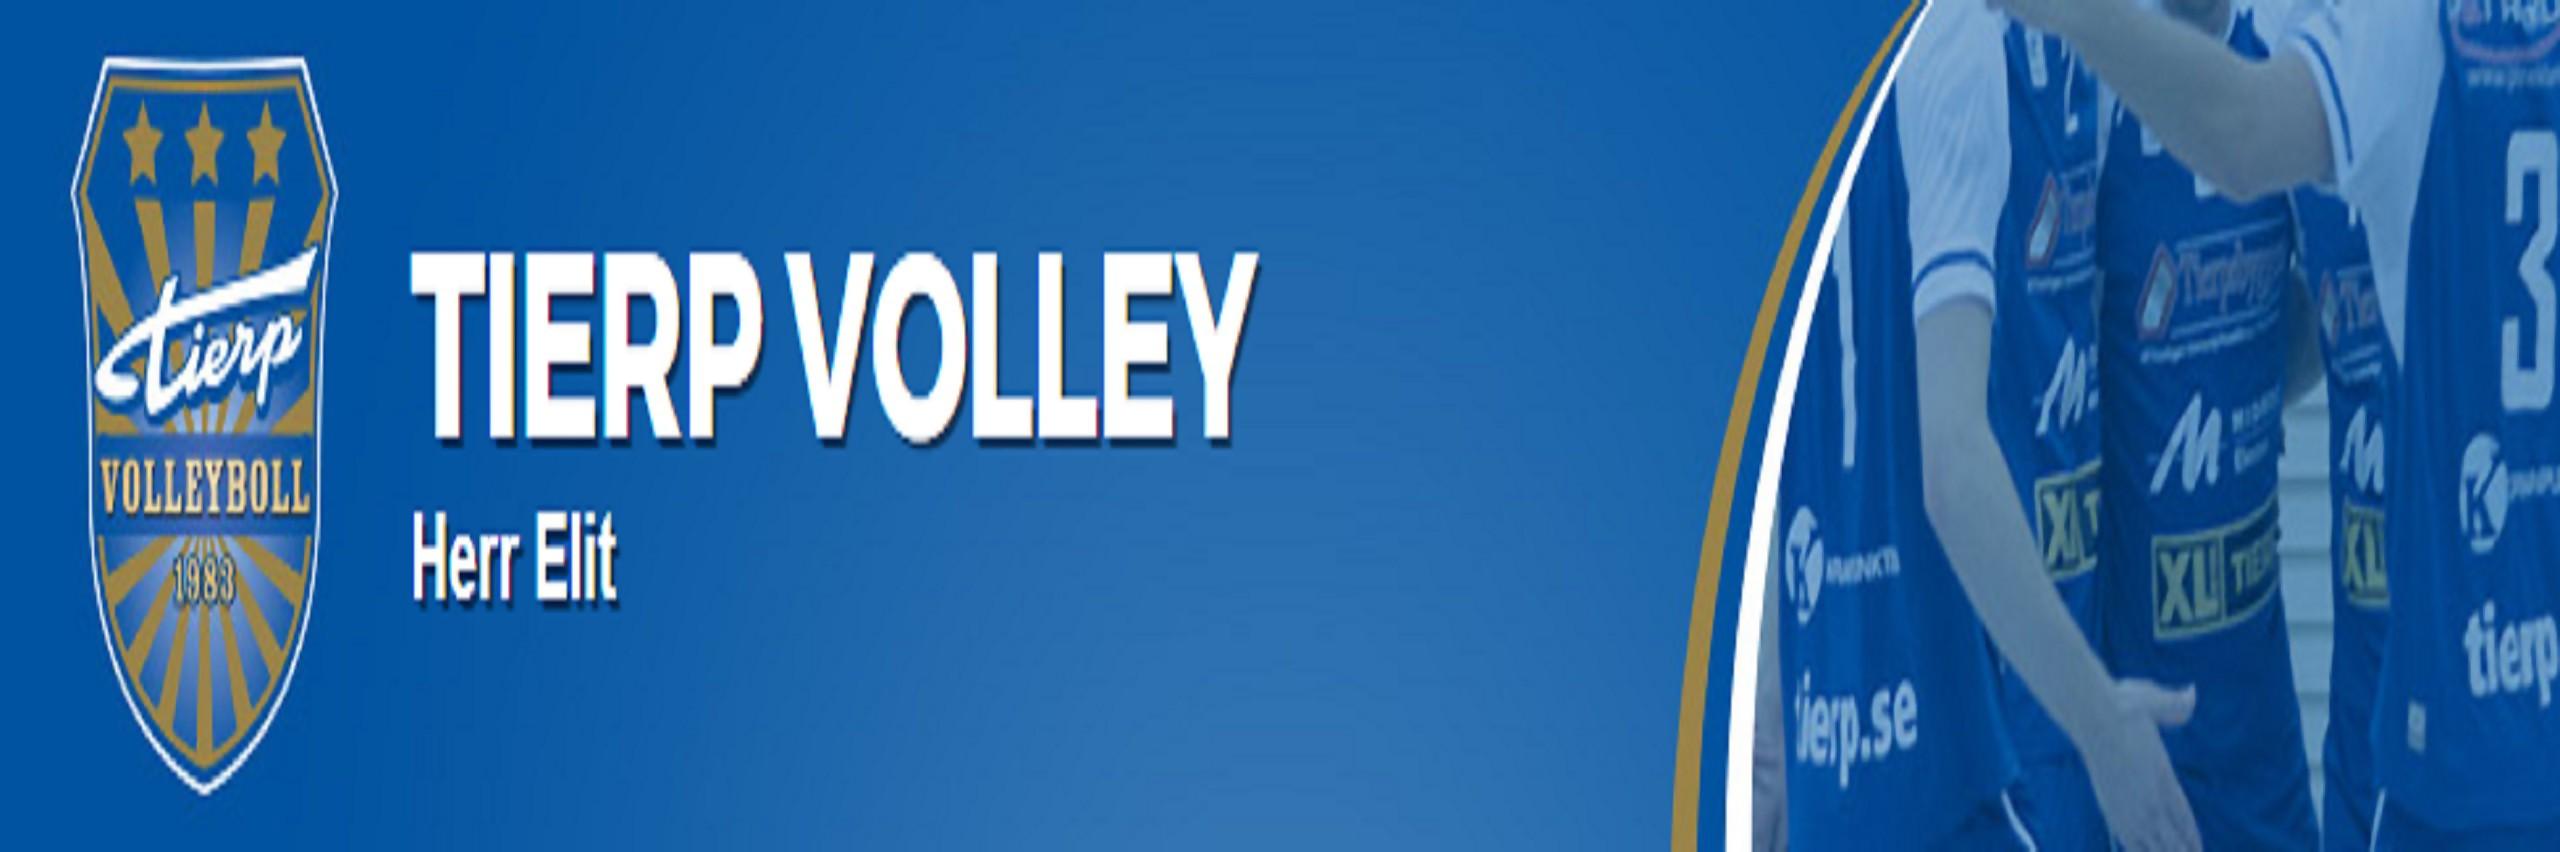 Tierp Volley LIVE